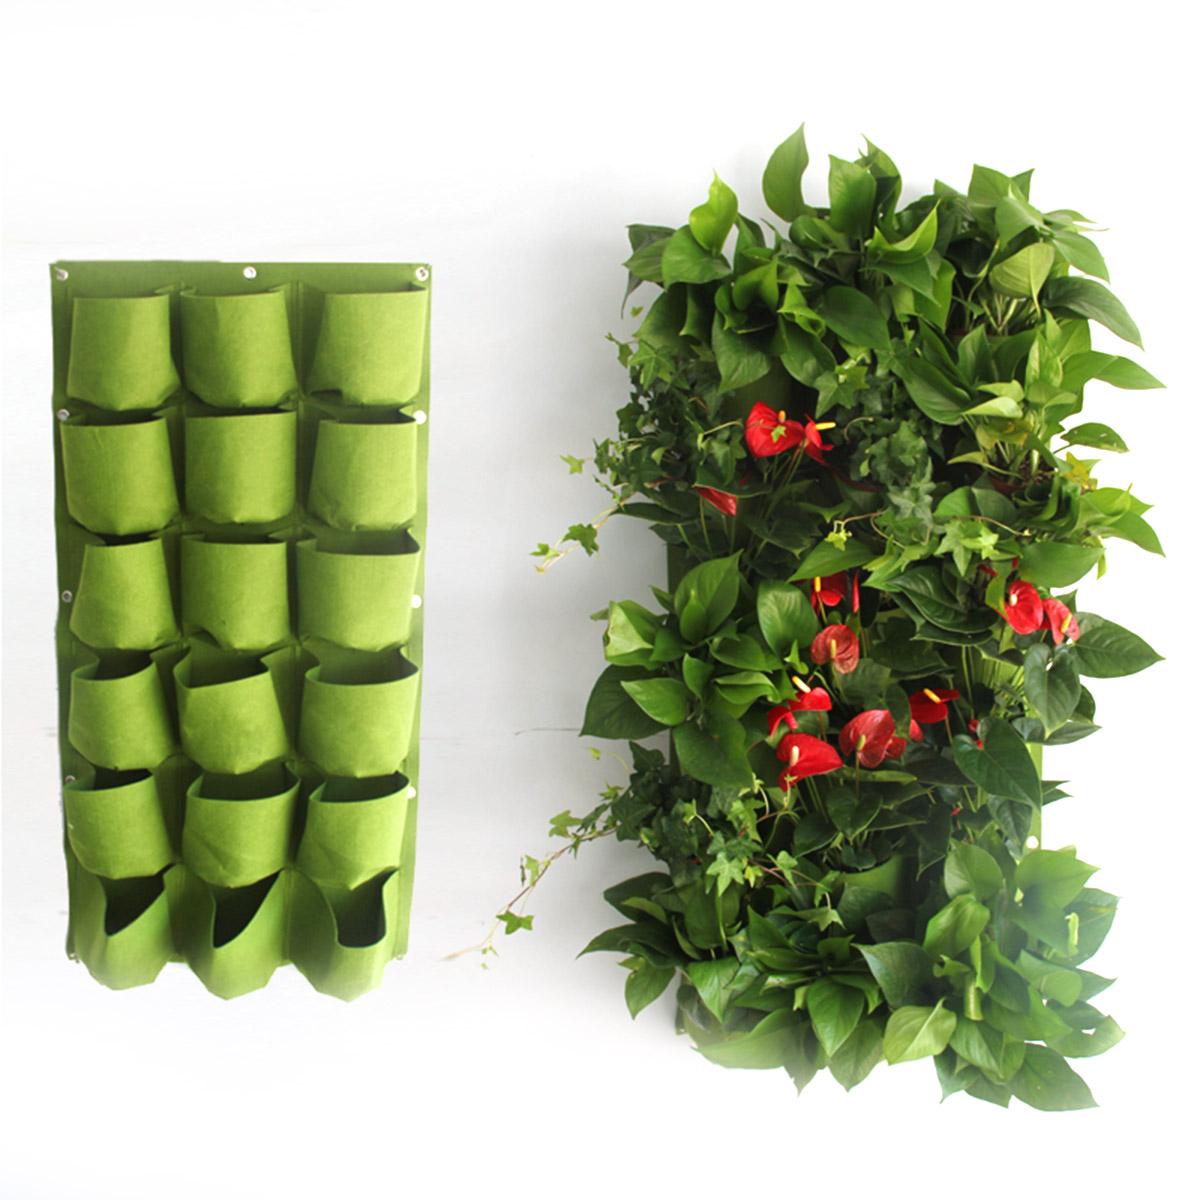 Indoor Vertical Garden Wall Planter Hanging Flower Pouch Pot For